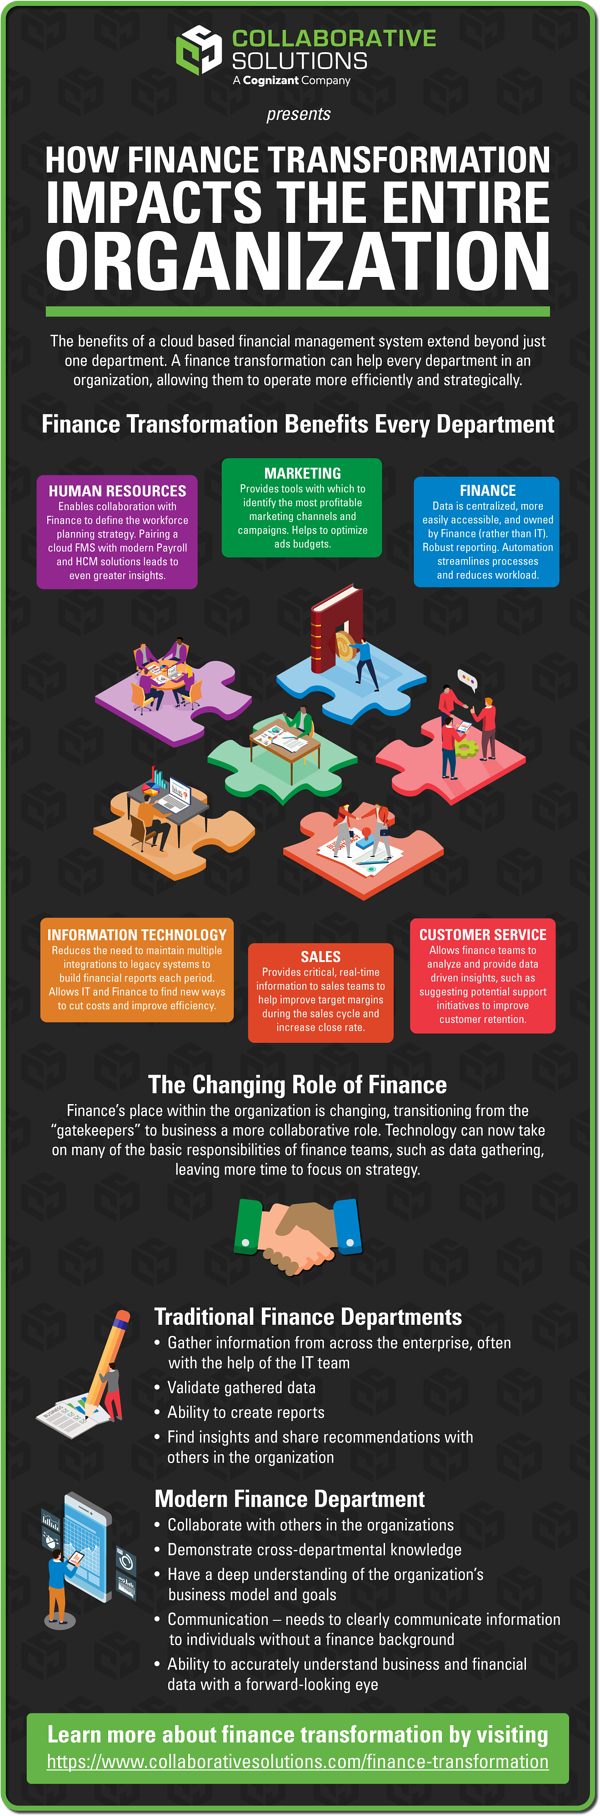 Benefits of finance transformation throughout organization